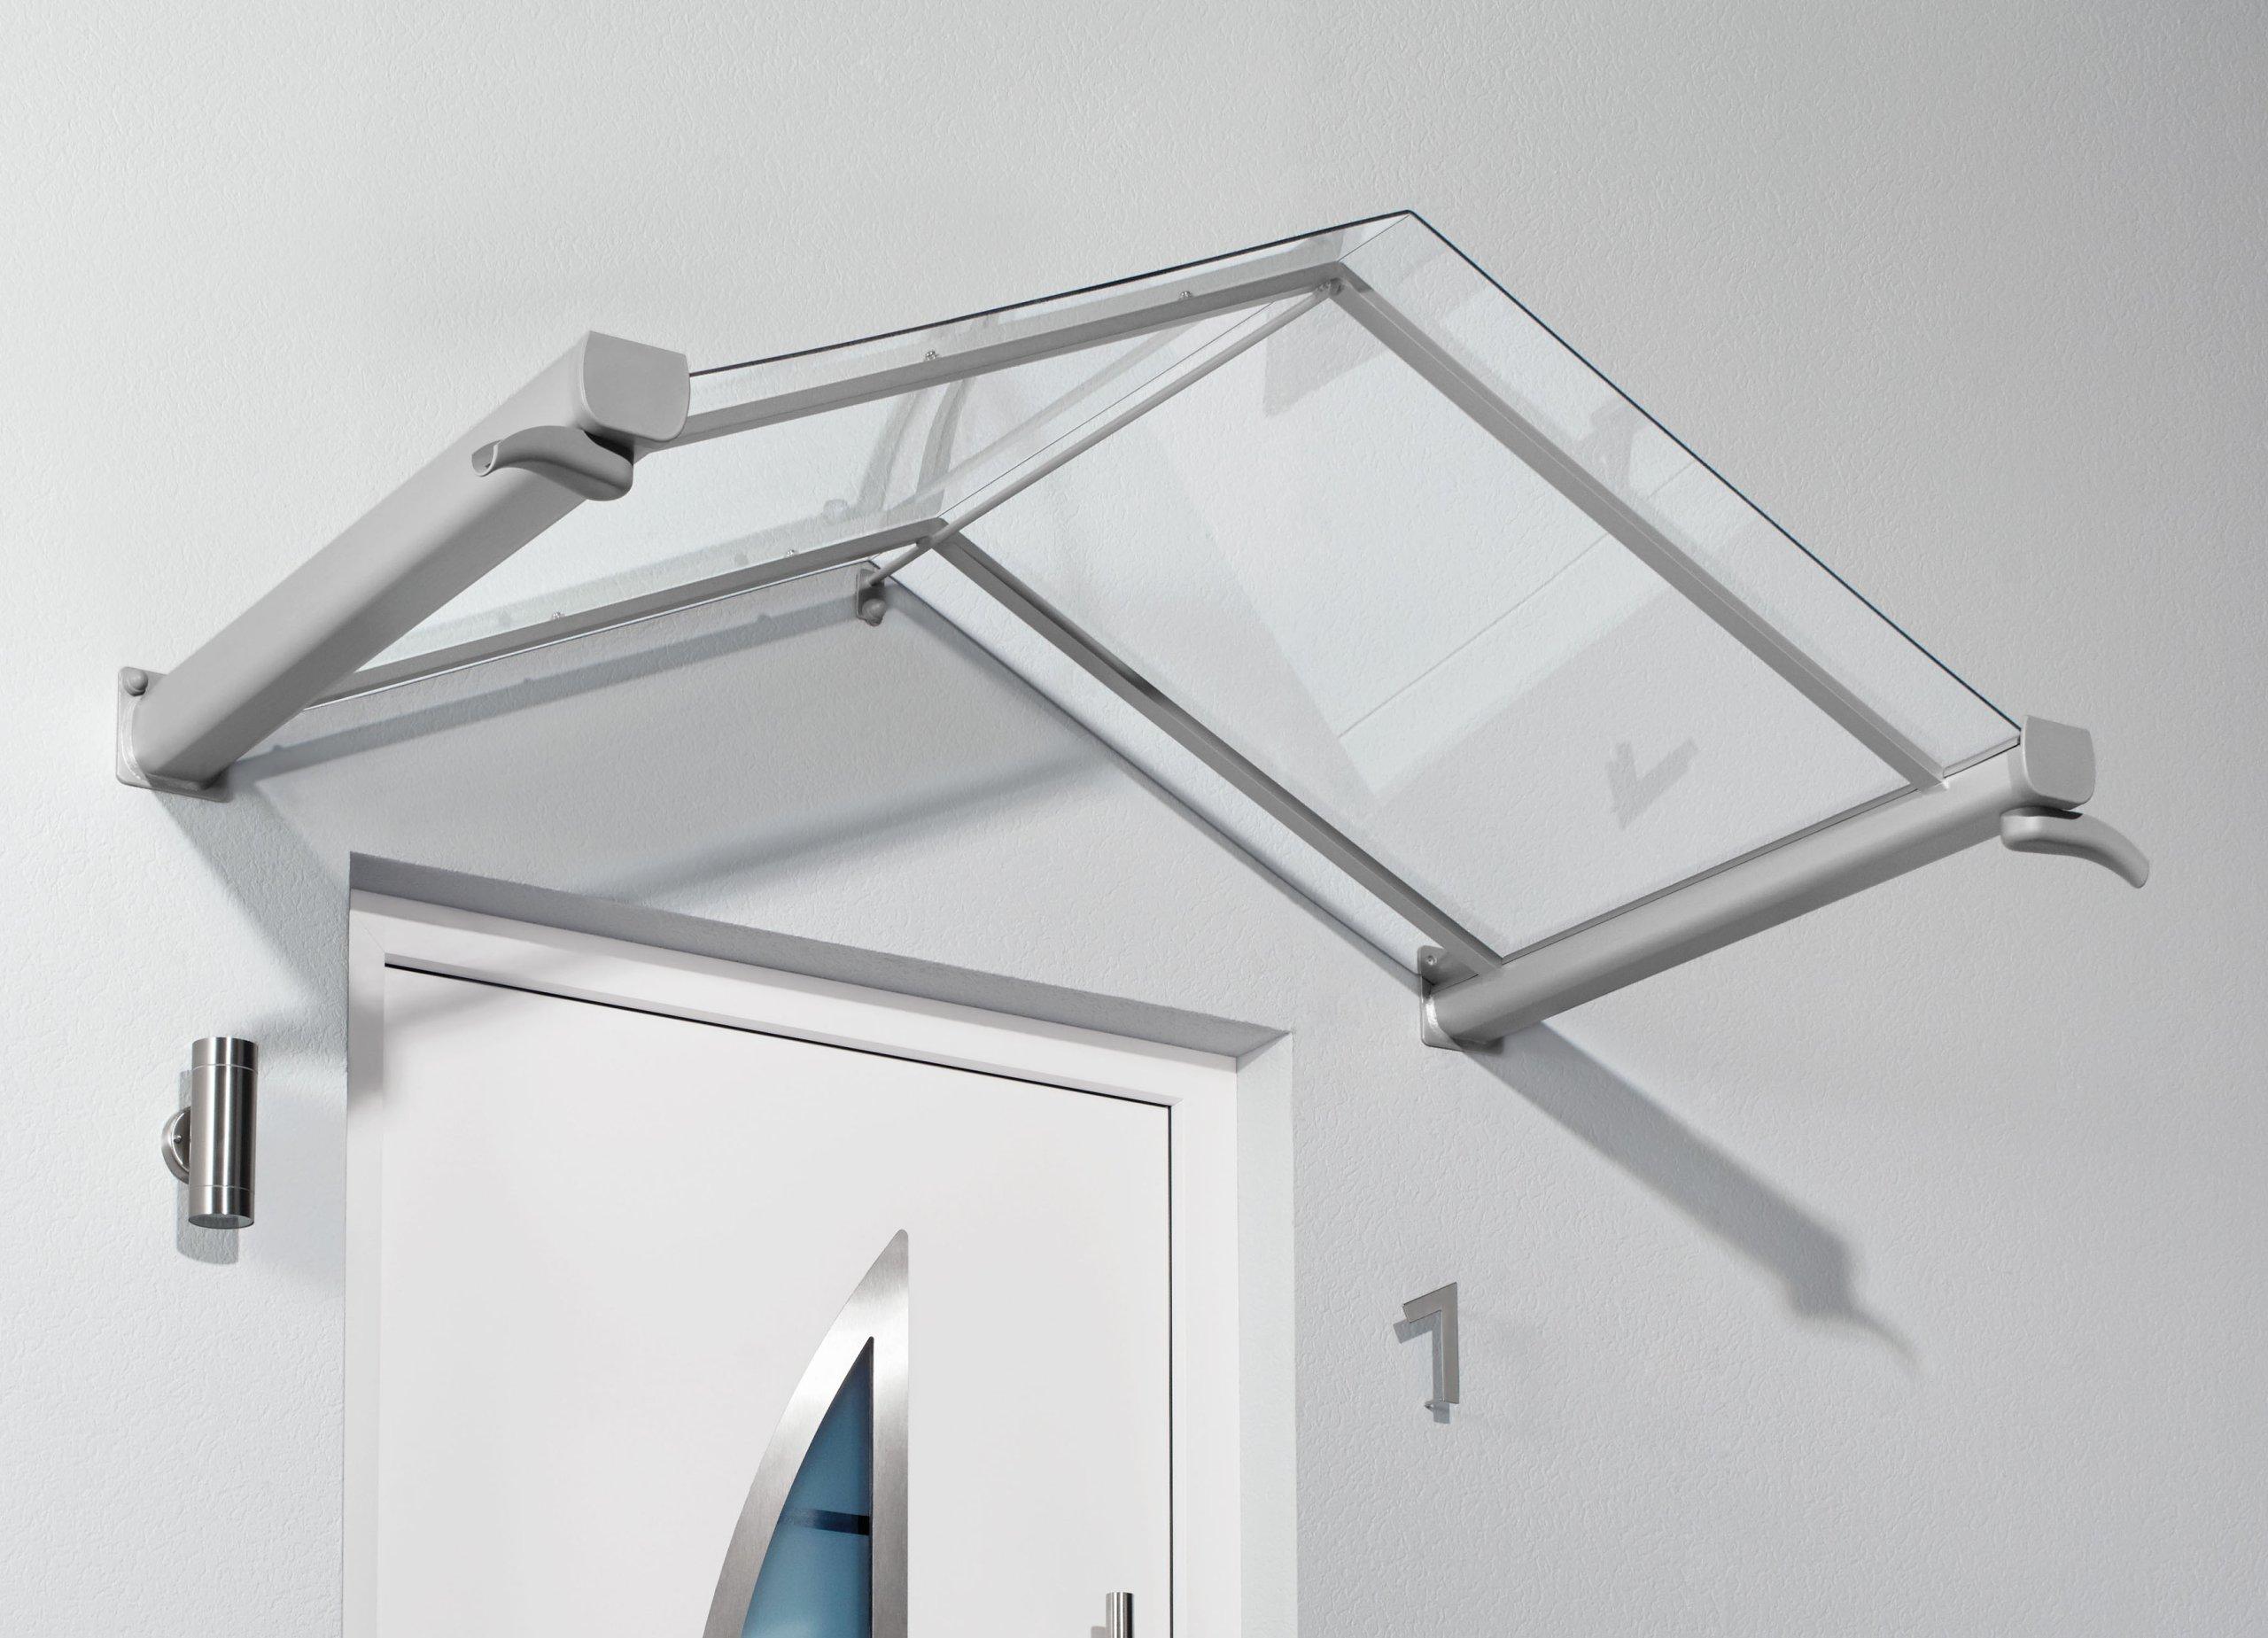 Baldachýn guta nad dverami baldachýn akrylový 160 x 90